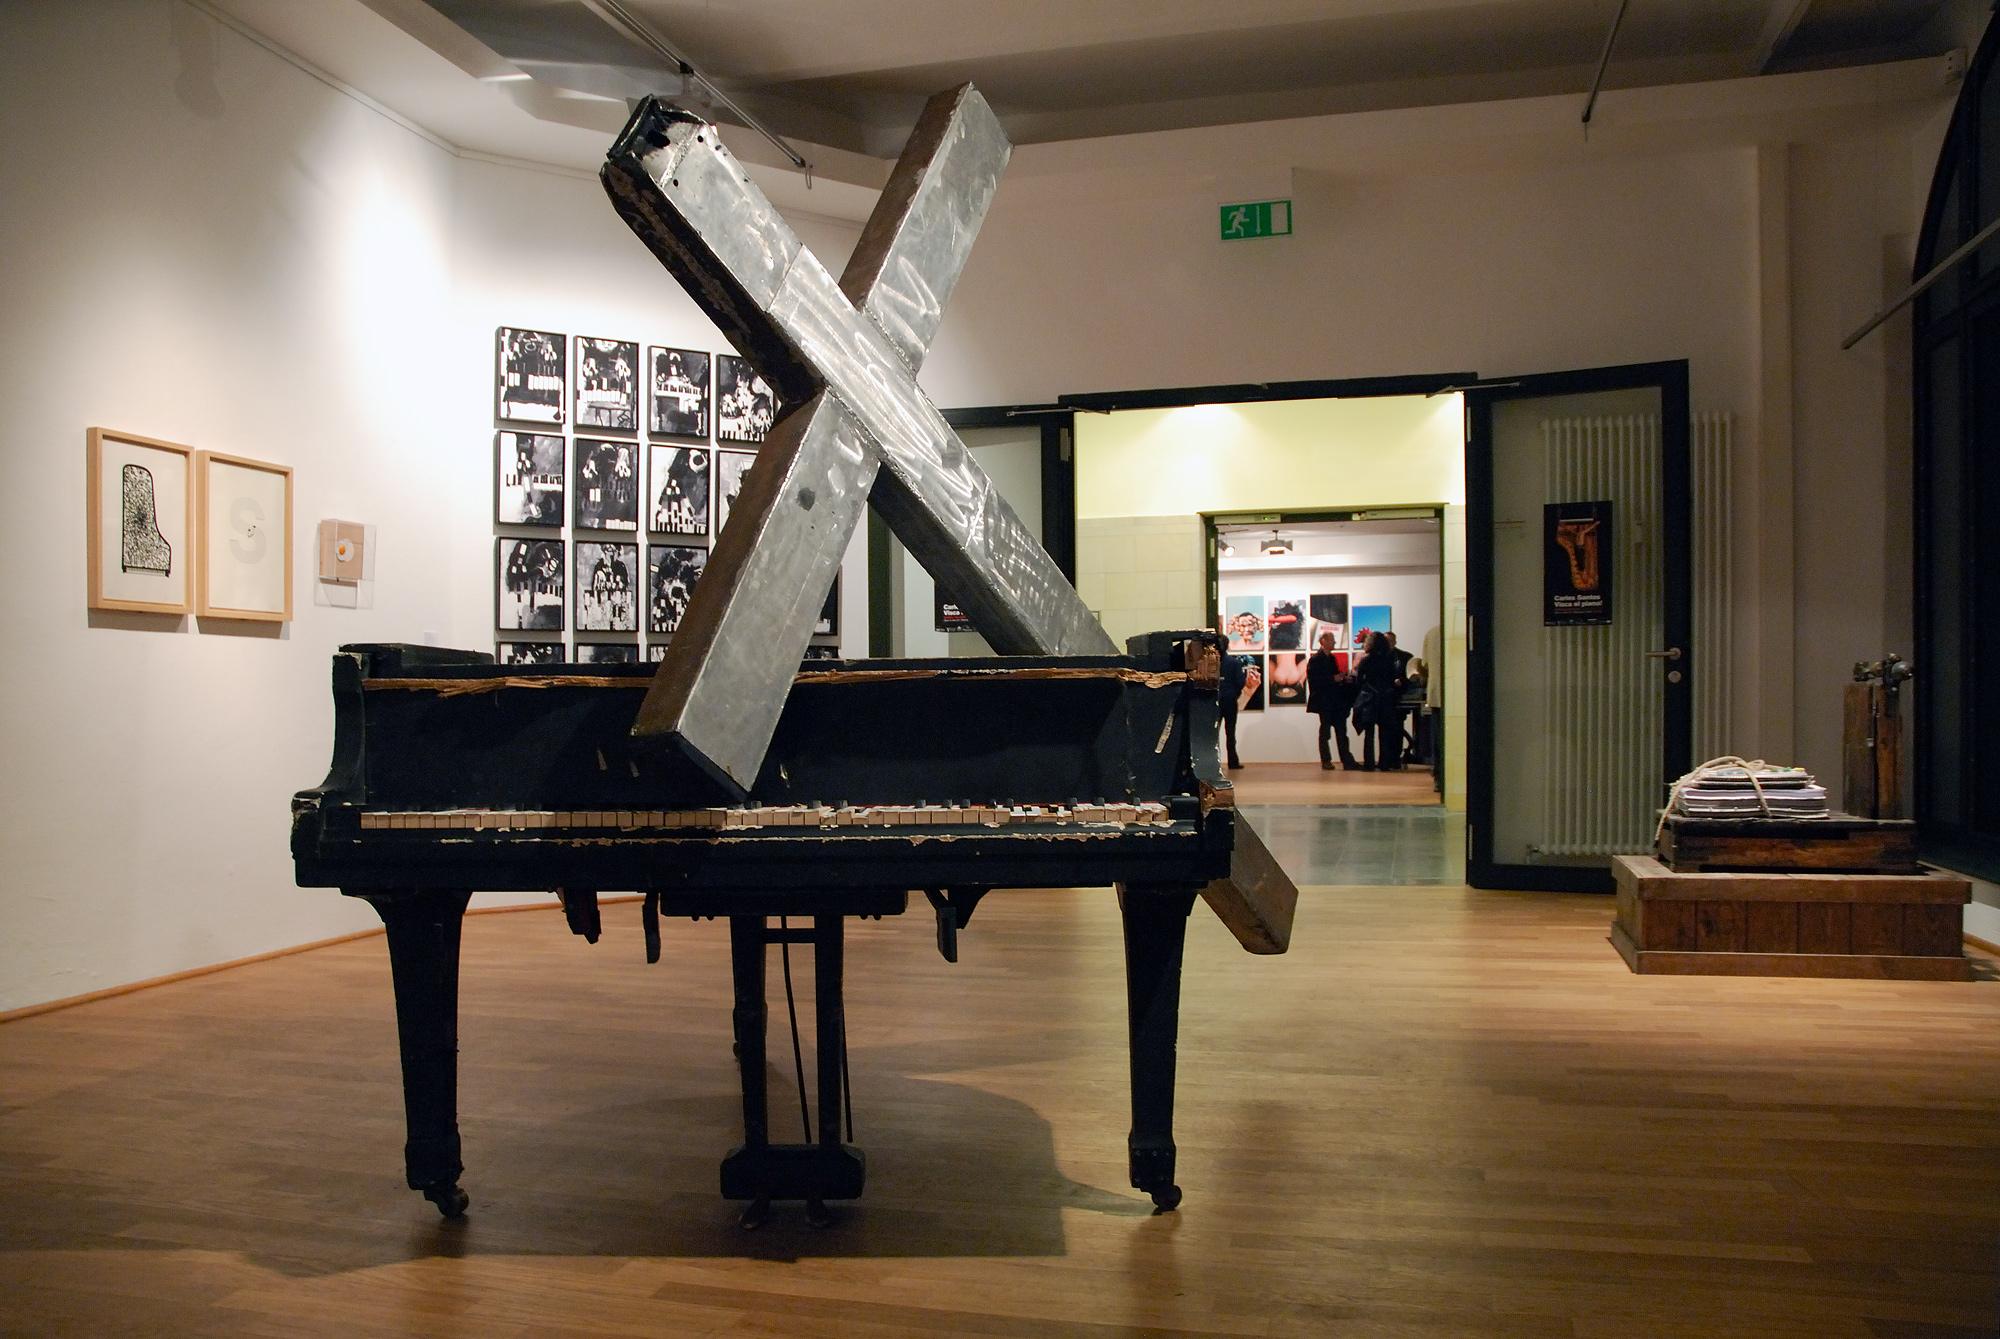 Exhibition in Instituto Cervantes Berlin